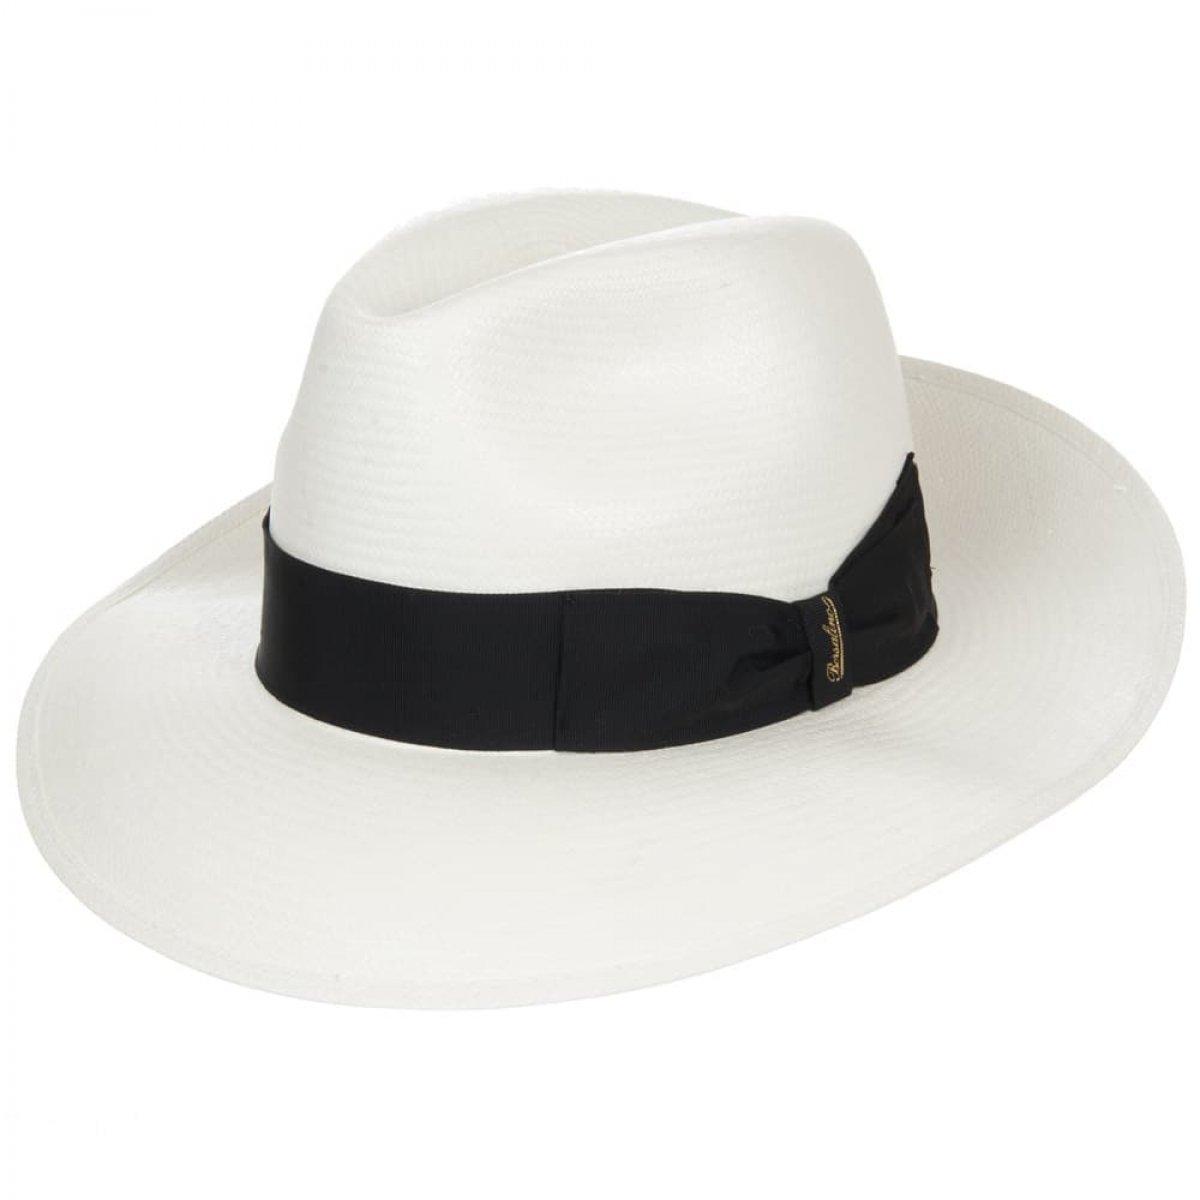 Larga Bianco BorsalinoA In Tesa Panama Cappello Tl3u1JcFK